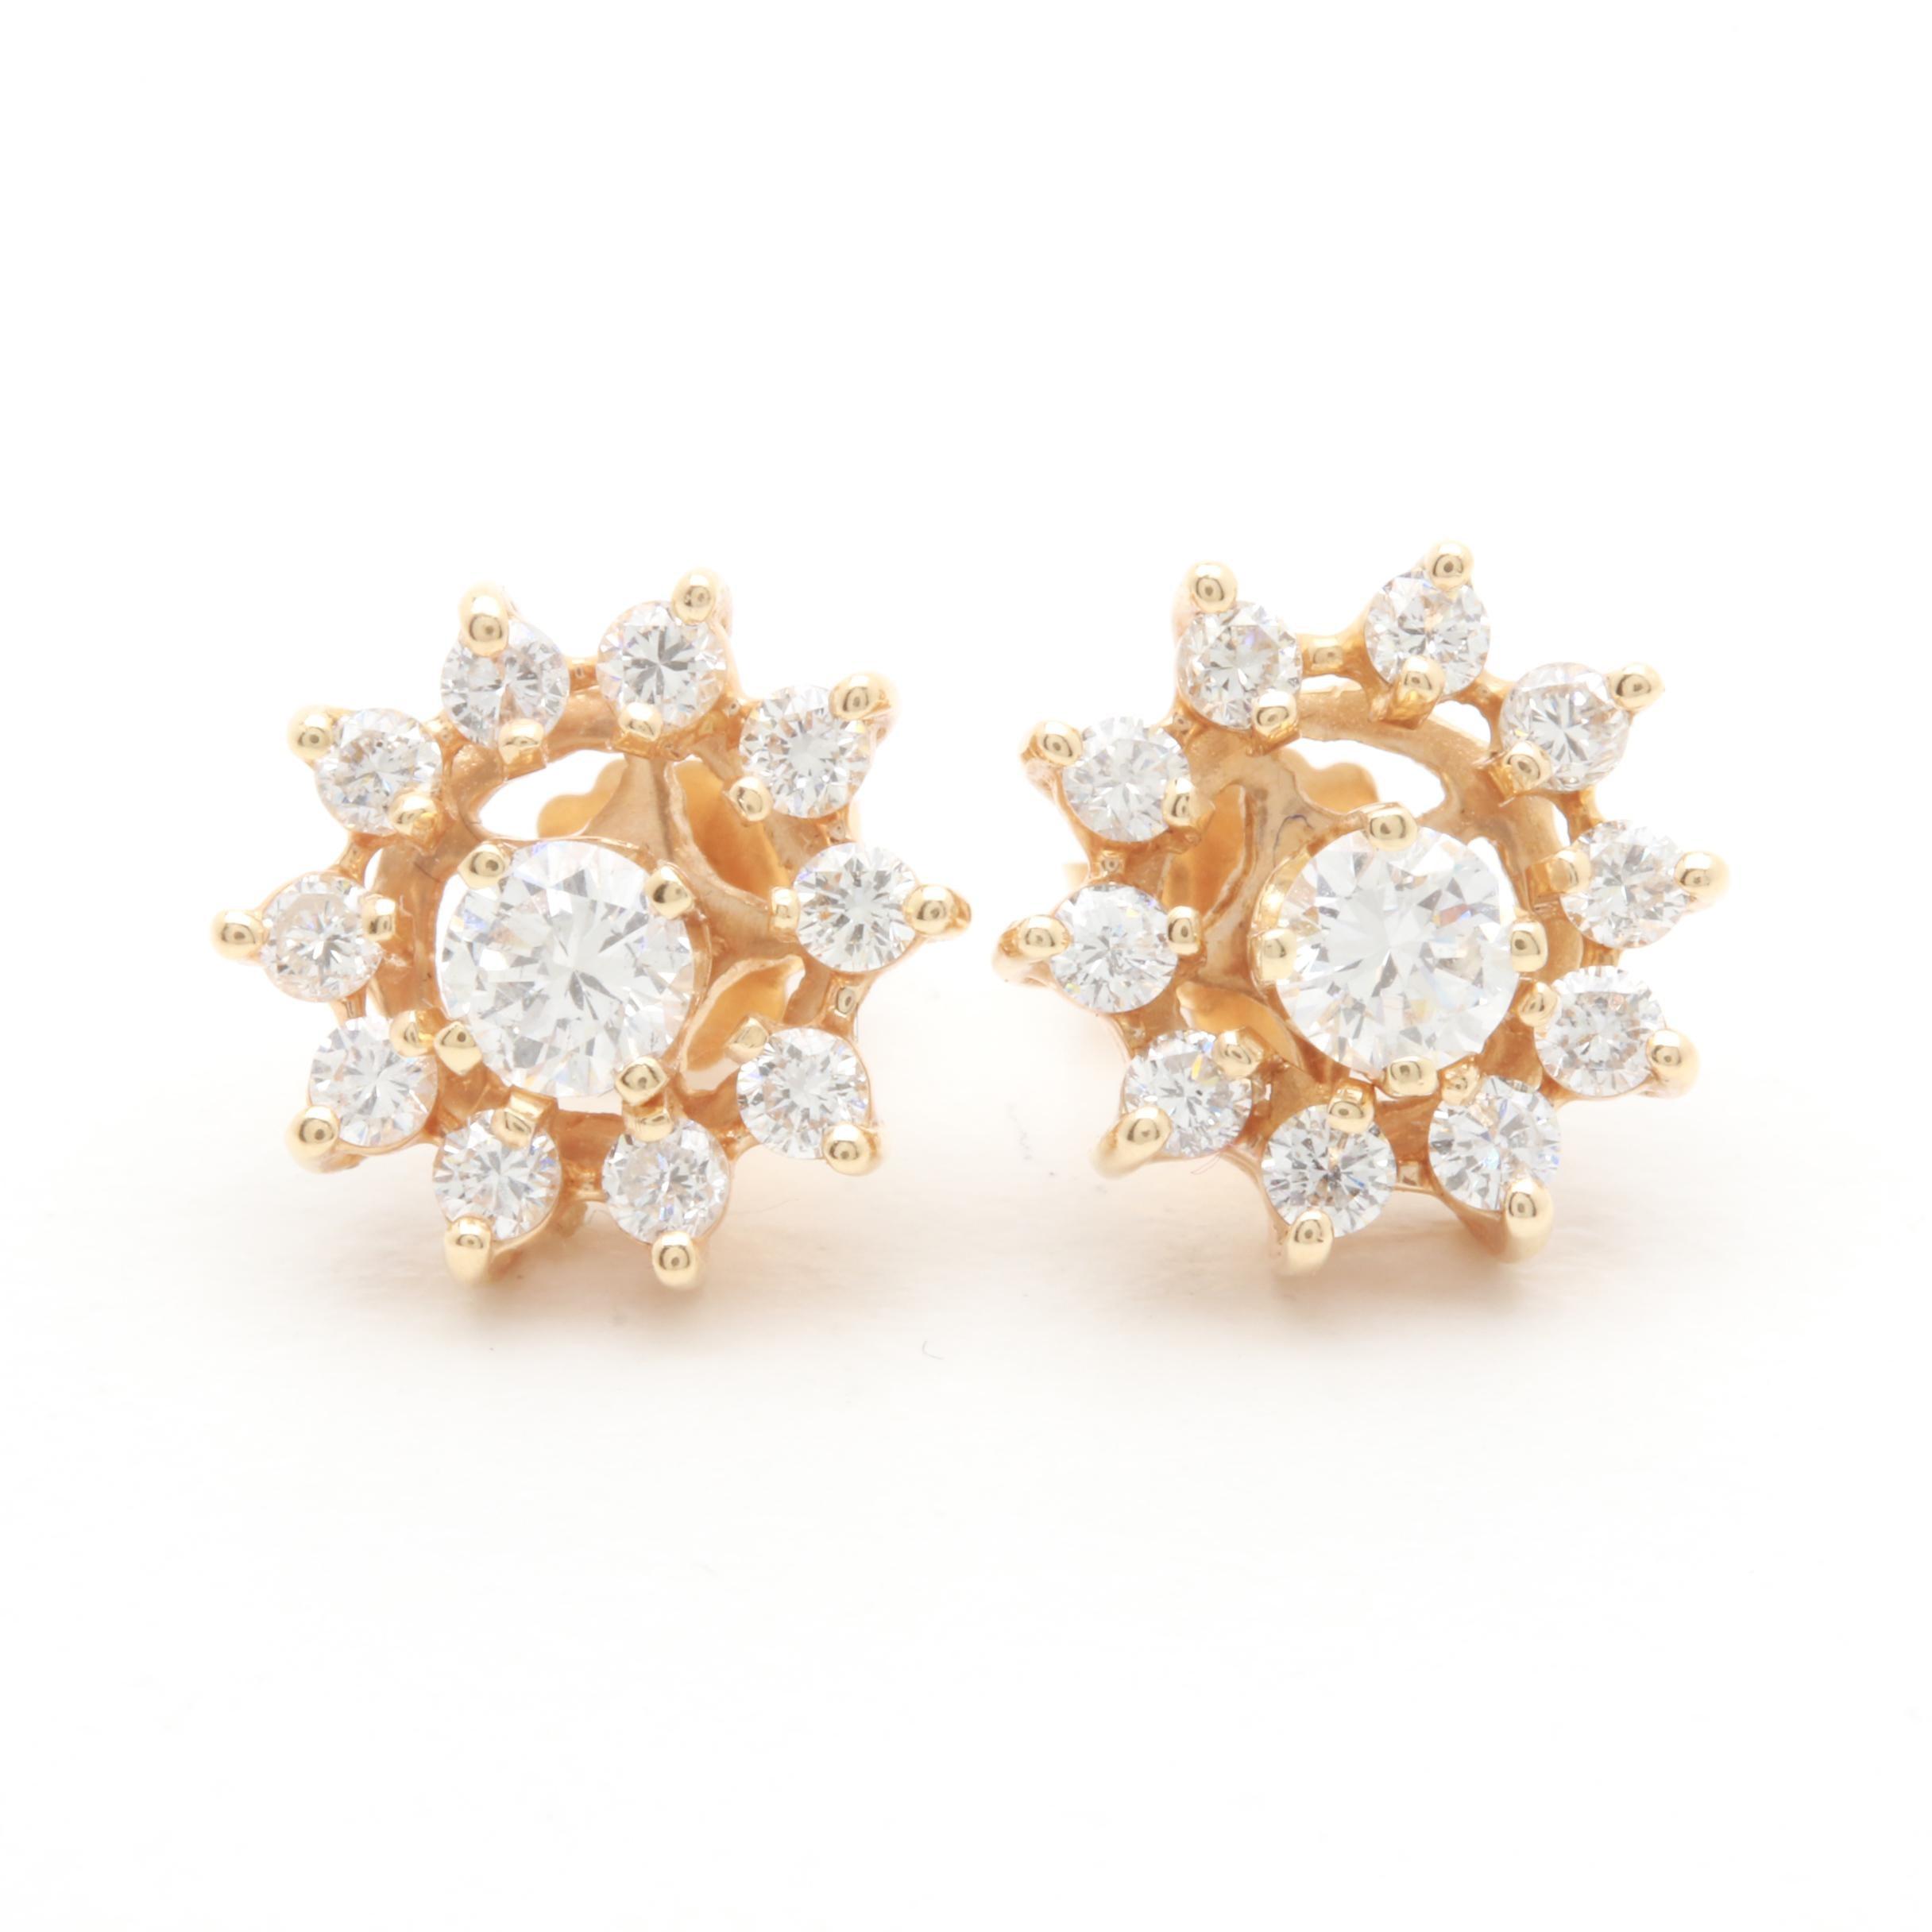 14K Yellow Gold Diamond Stud Earrings and Jackets